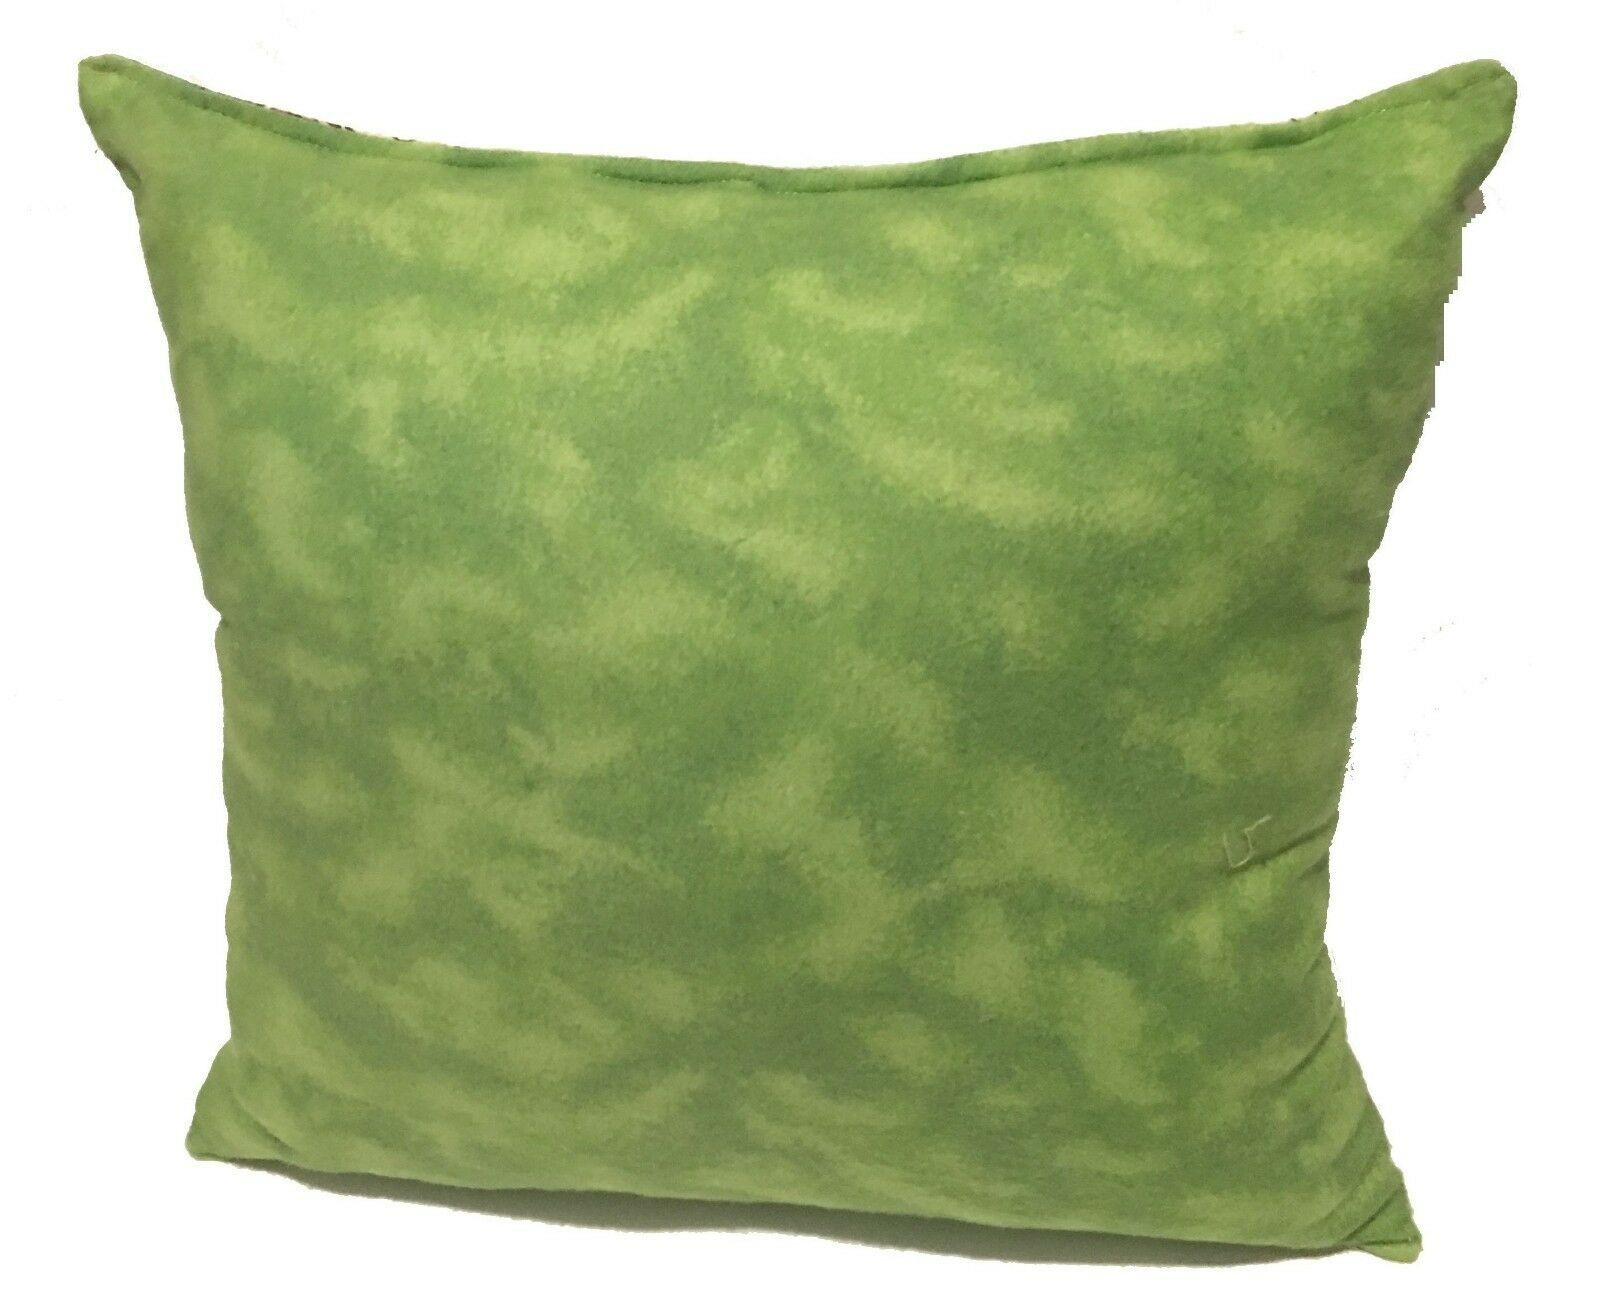 Rugrats Pillow And Blanket Rug Rats Pillow Cartoon Pillow Handmade In USA